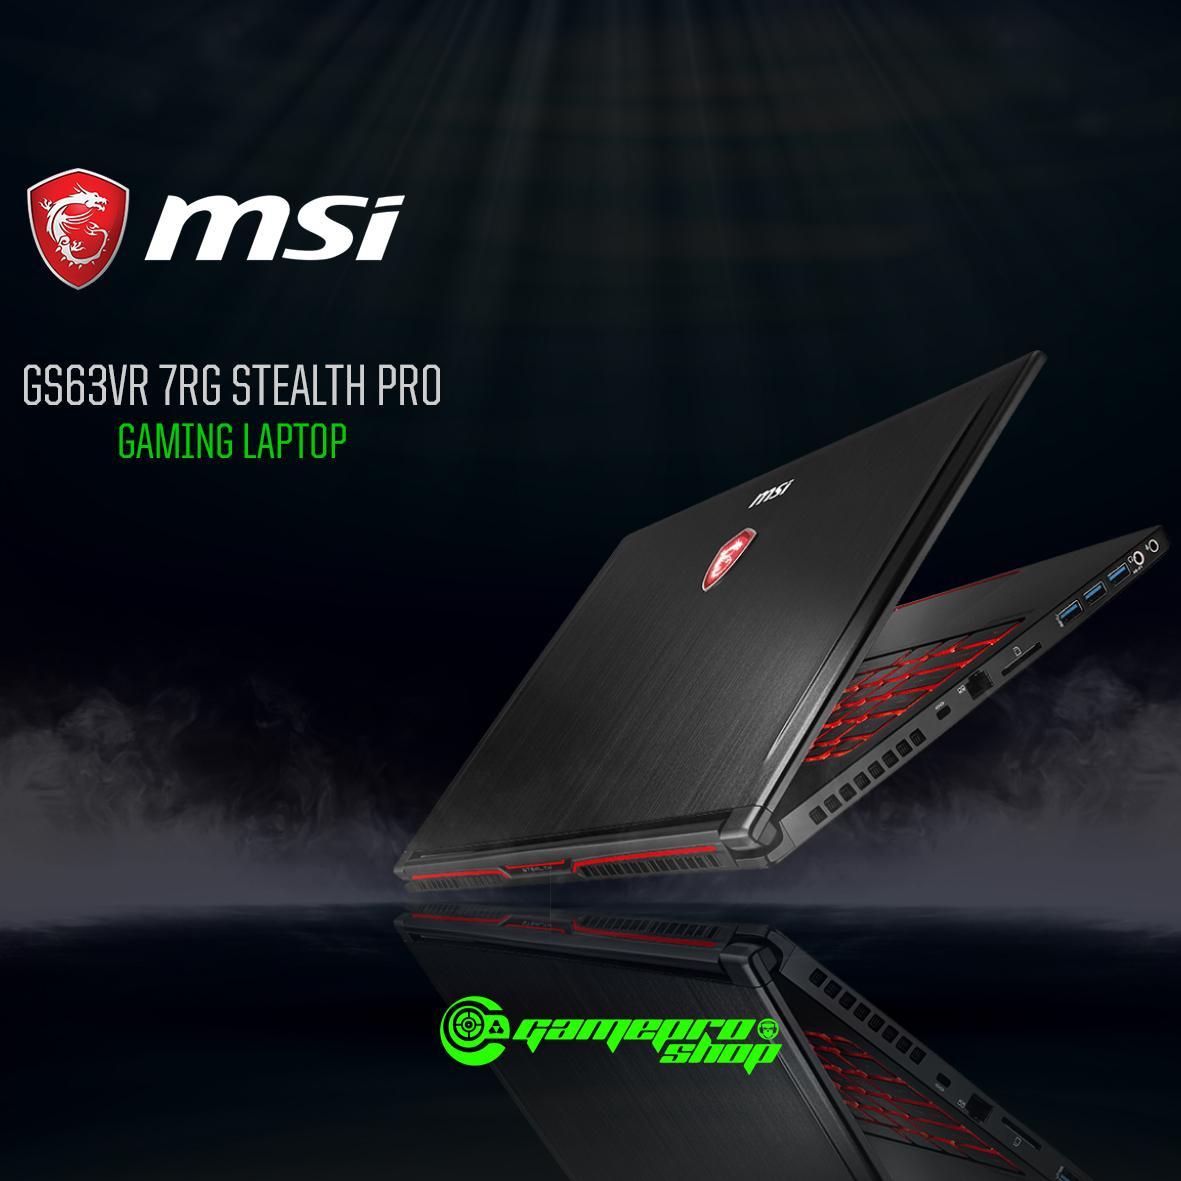 MSI GS63VR 7RG Stealth Pro-086SG (I7-7700HQ/16GB DDR4/256GB SSD +2TB HDD/8GB NVIDIA GTX1070) GAMING LAPTOP *COMEX PROMO*